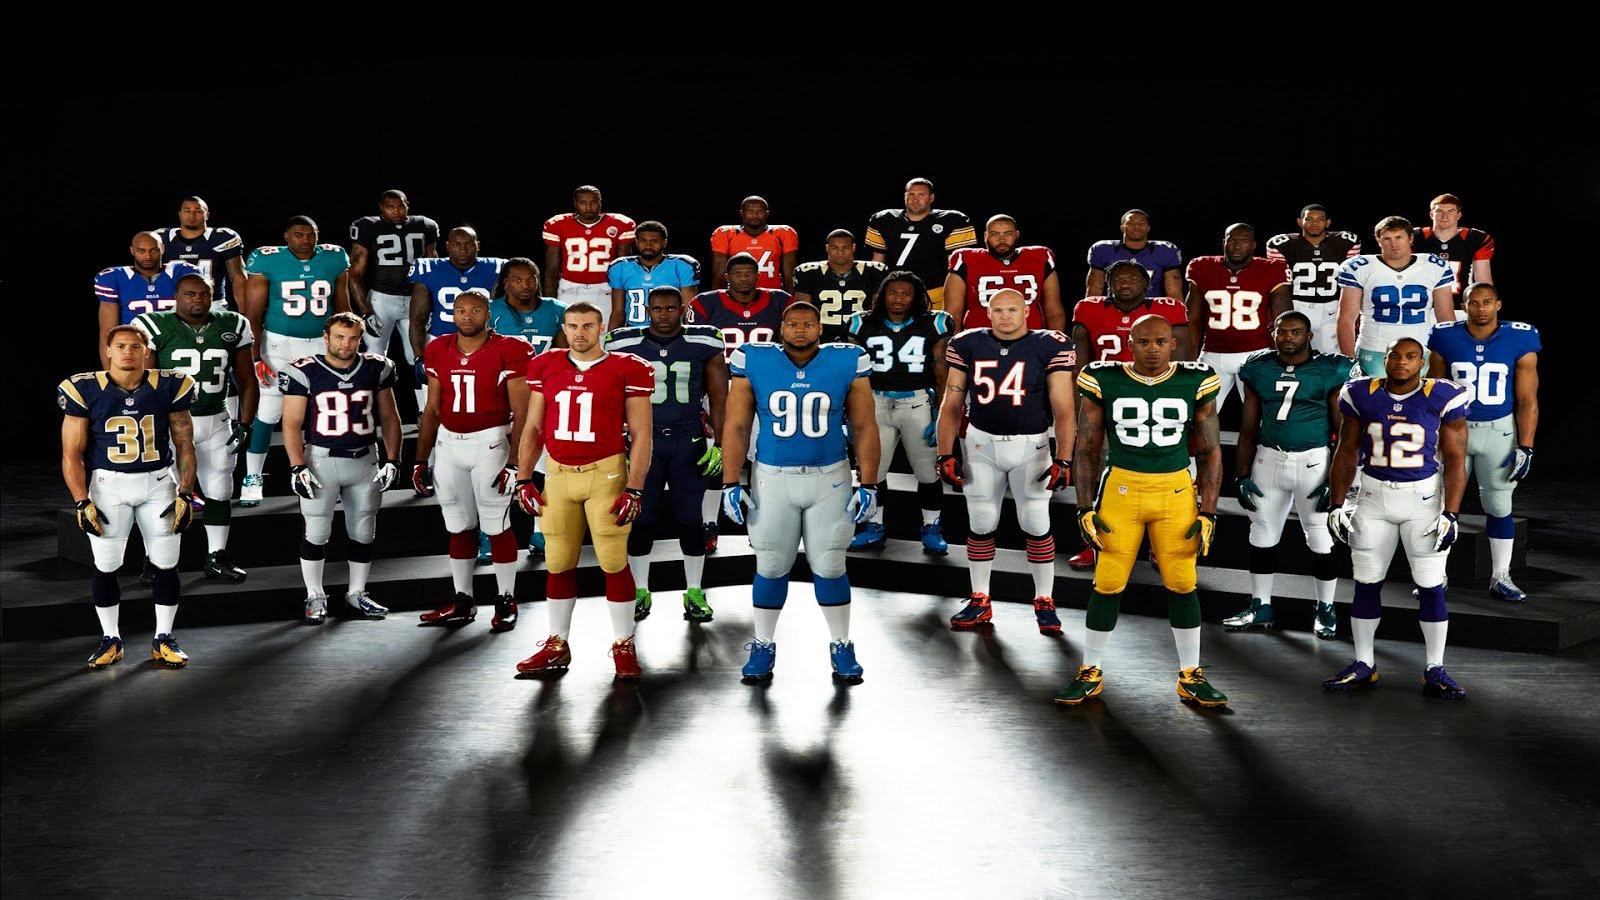 45] NFL Football Players Wallpaper on WallpaperSafari 1600x900